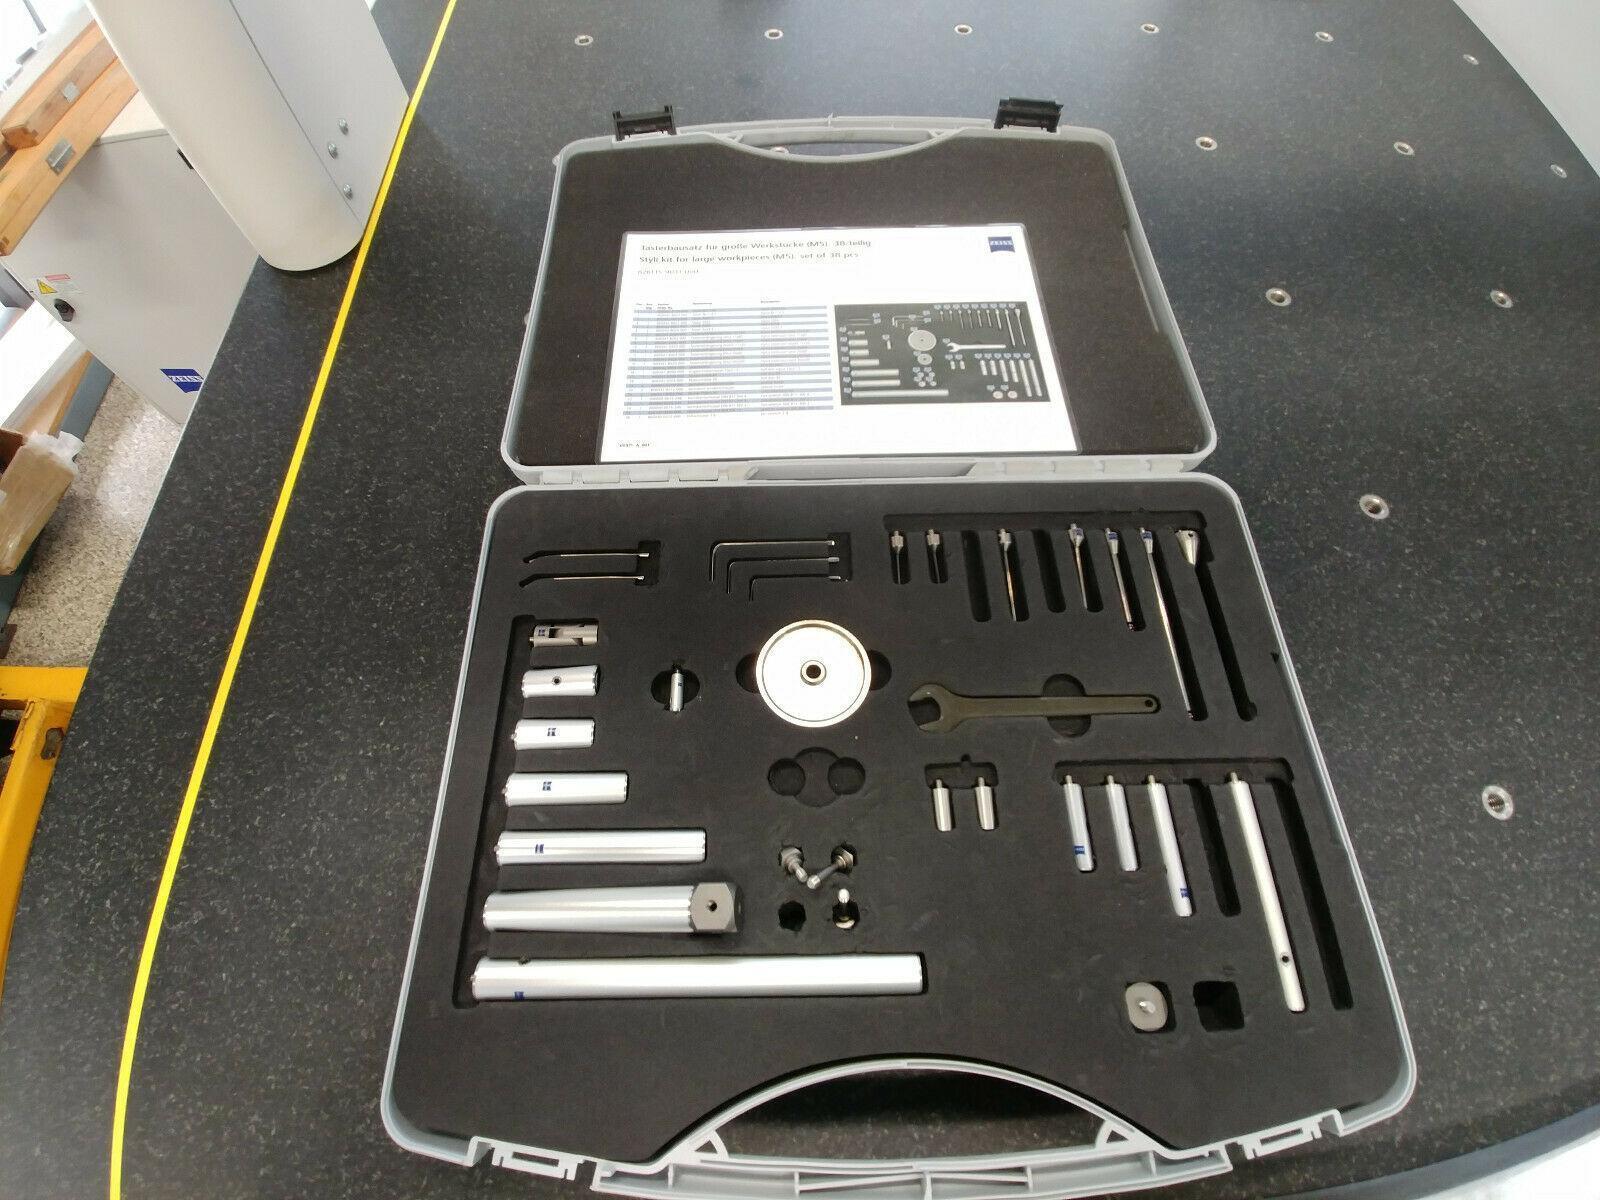 ZEISSZeiss Contura G2 10/16/6 Coordinate Measuring Machine (CMM) (#33218)